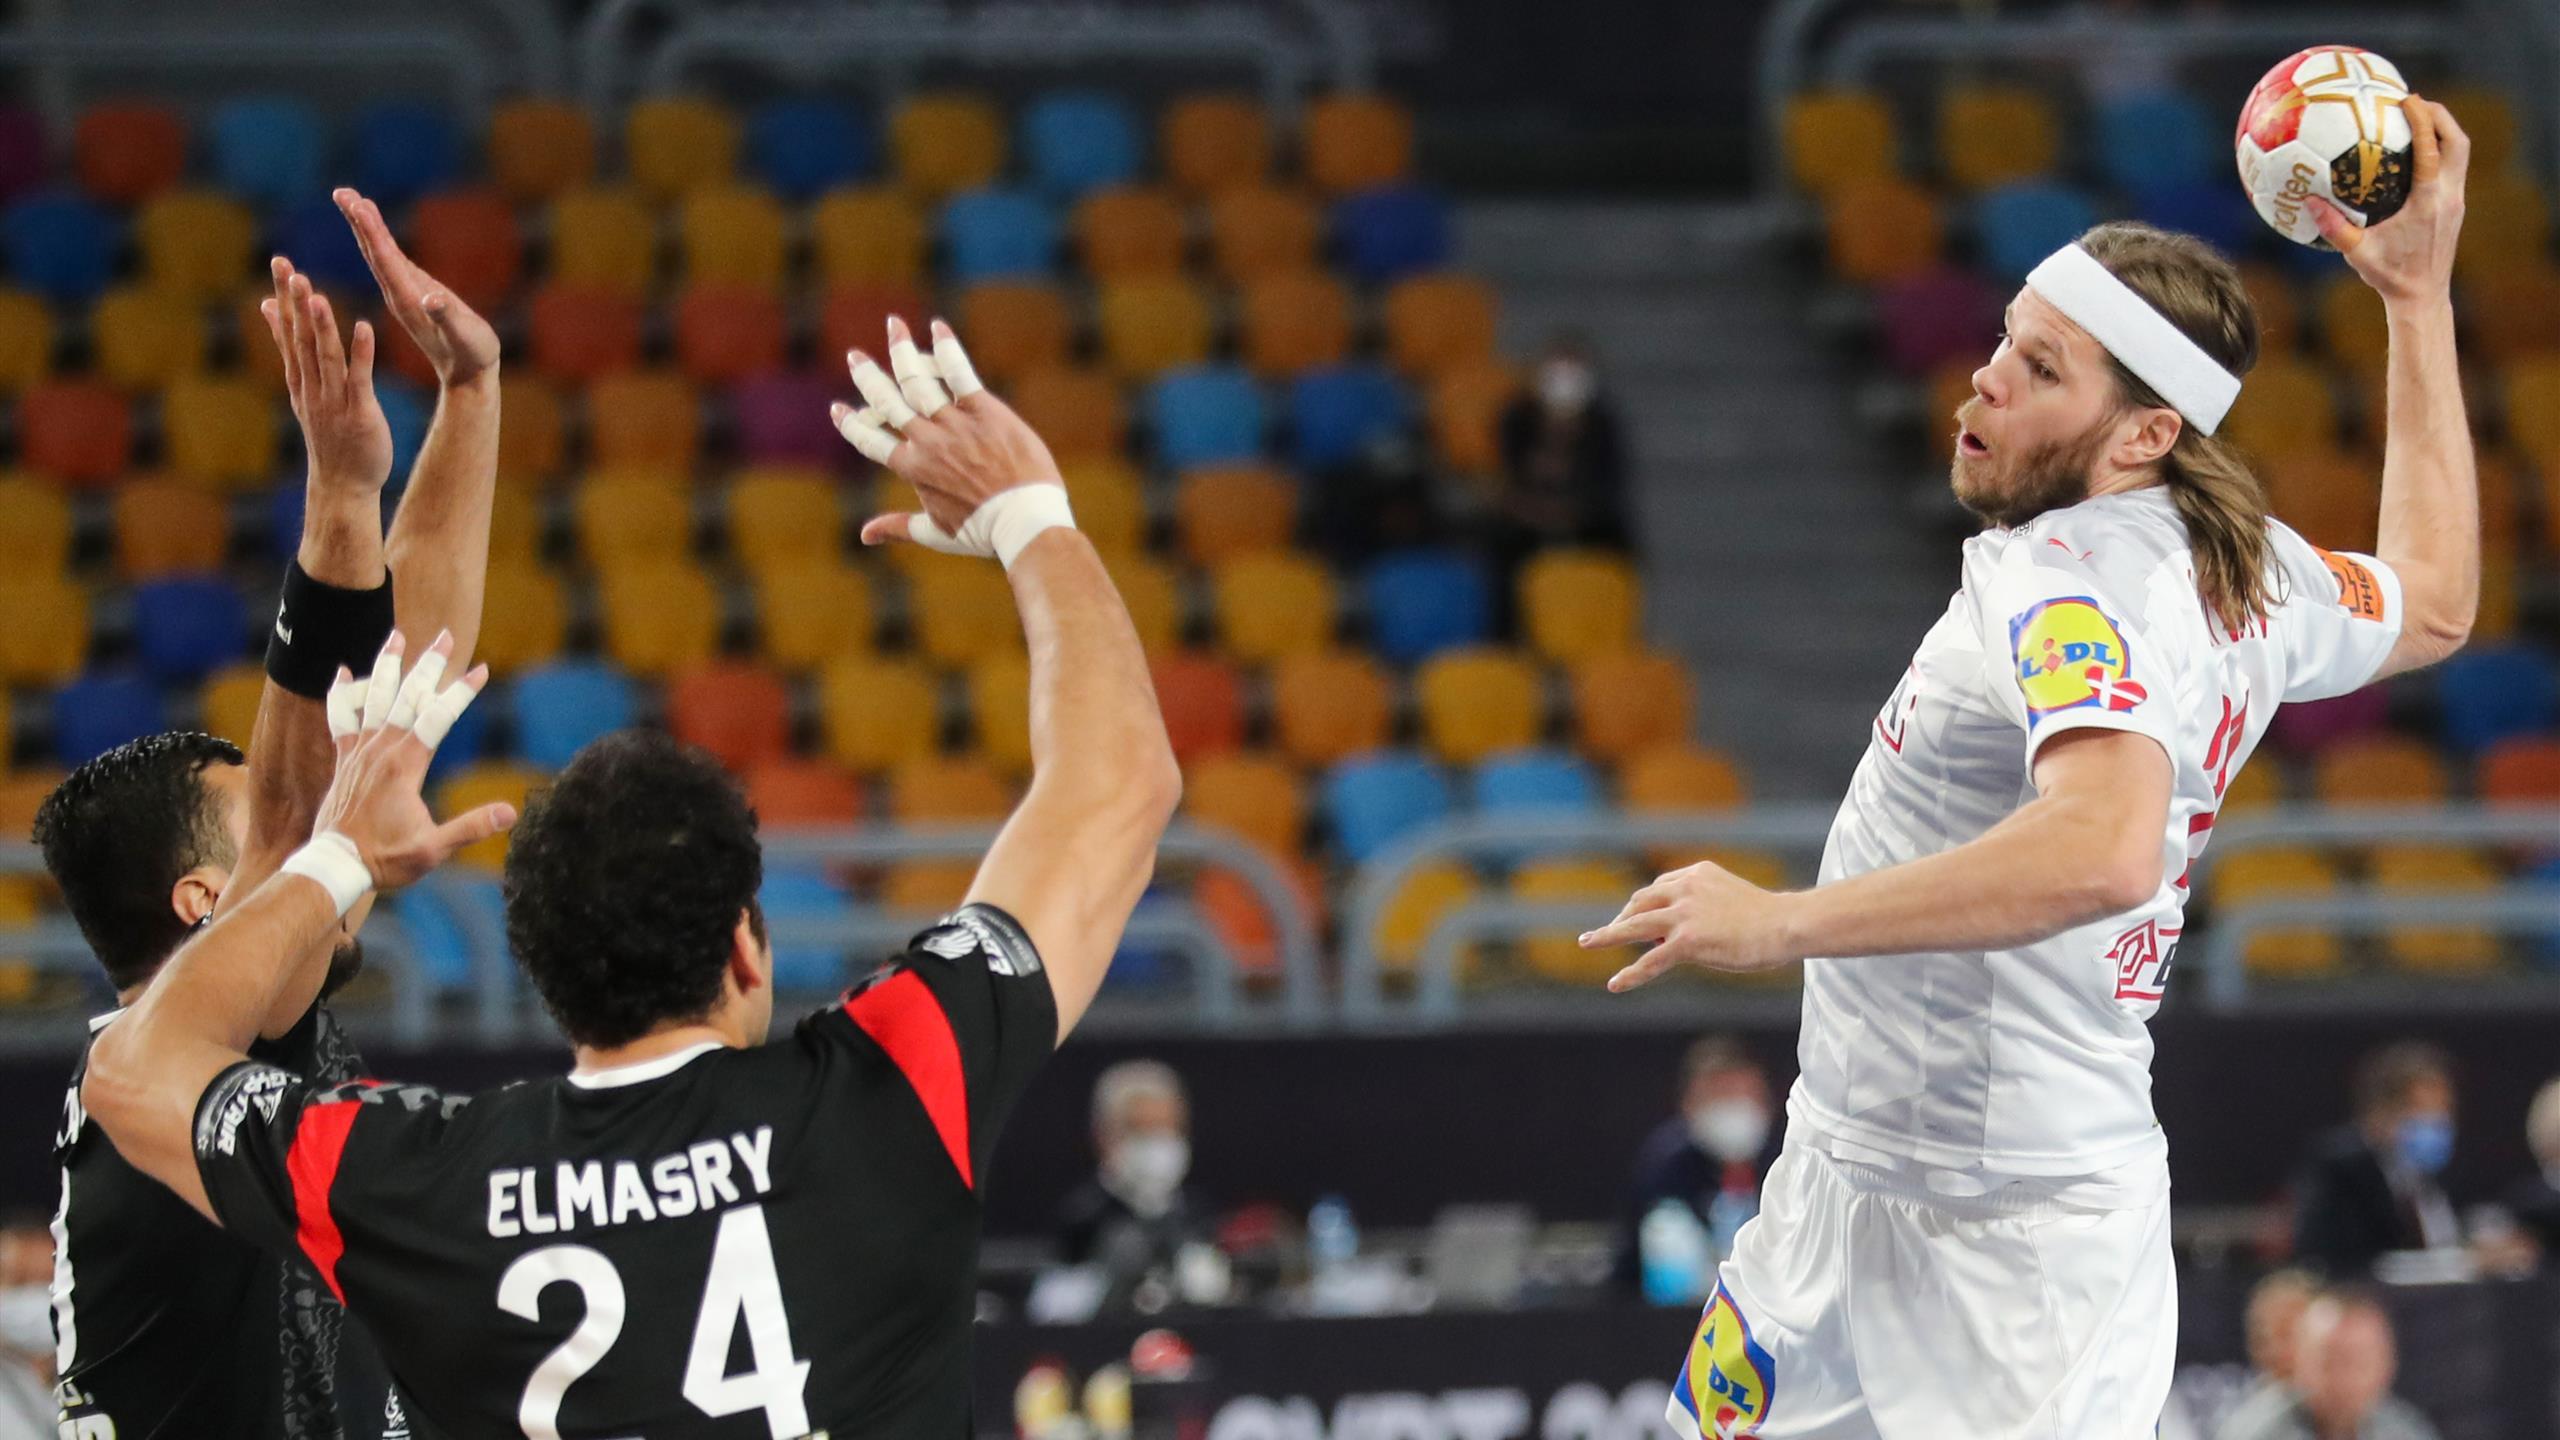 wm handball news ergebnisse eurosport